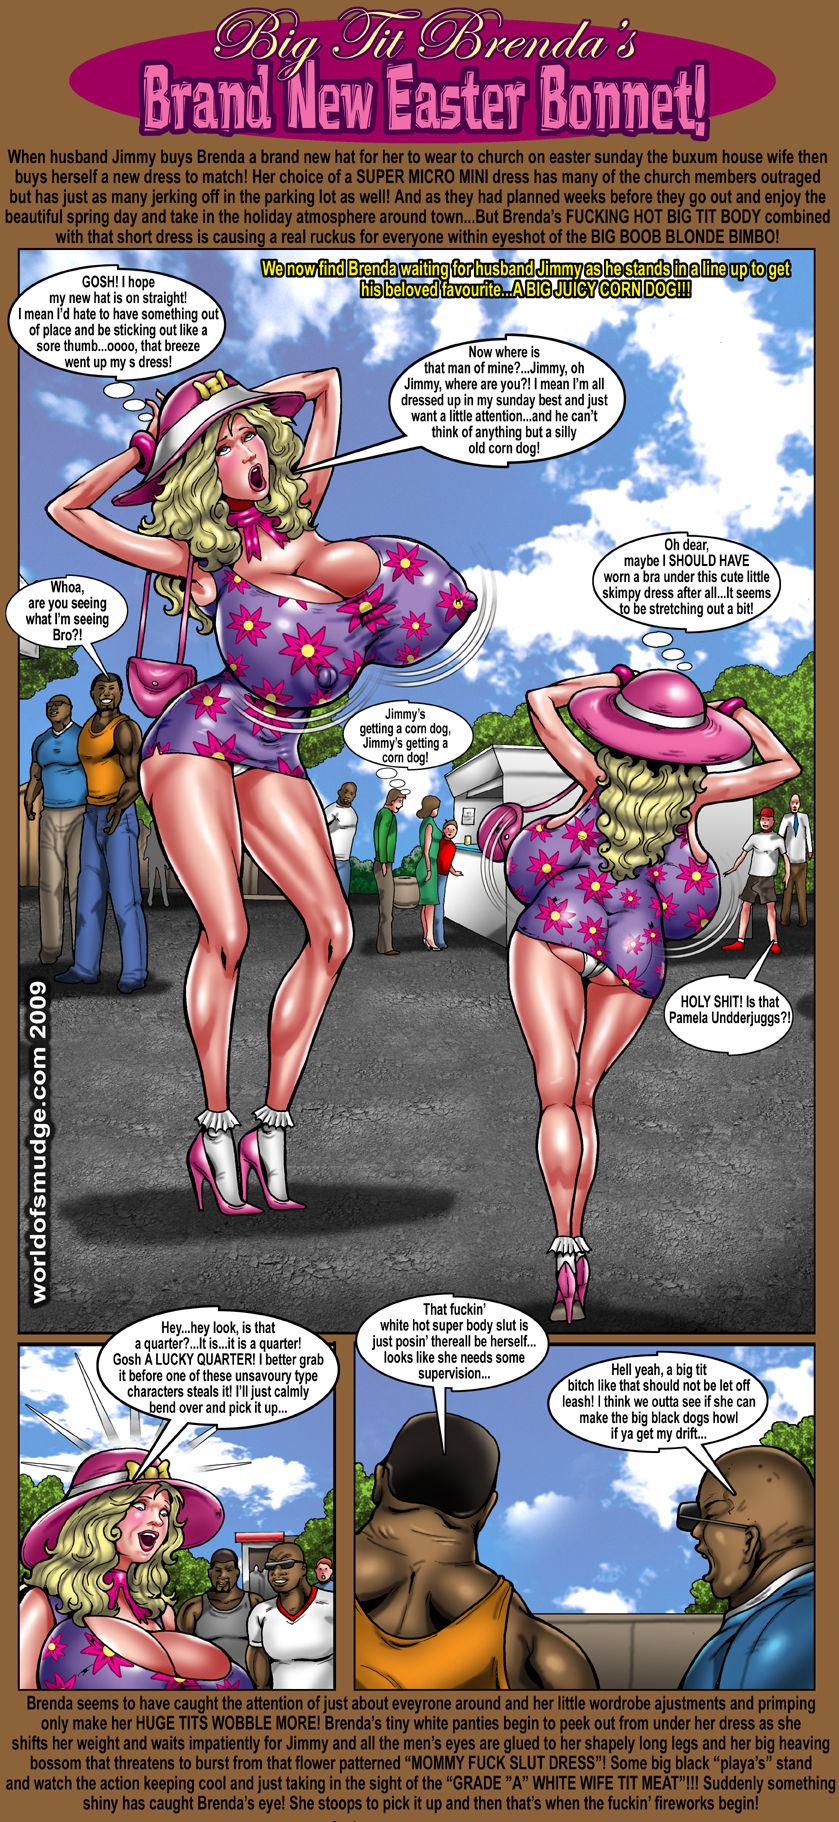 Porn Comics - Brand New Easter Bonnet- Smudge porn comics 8 muses